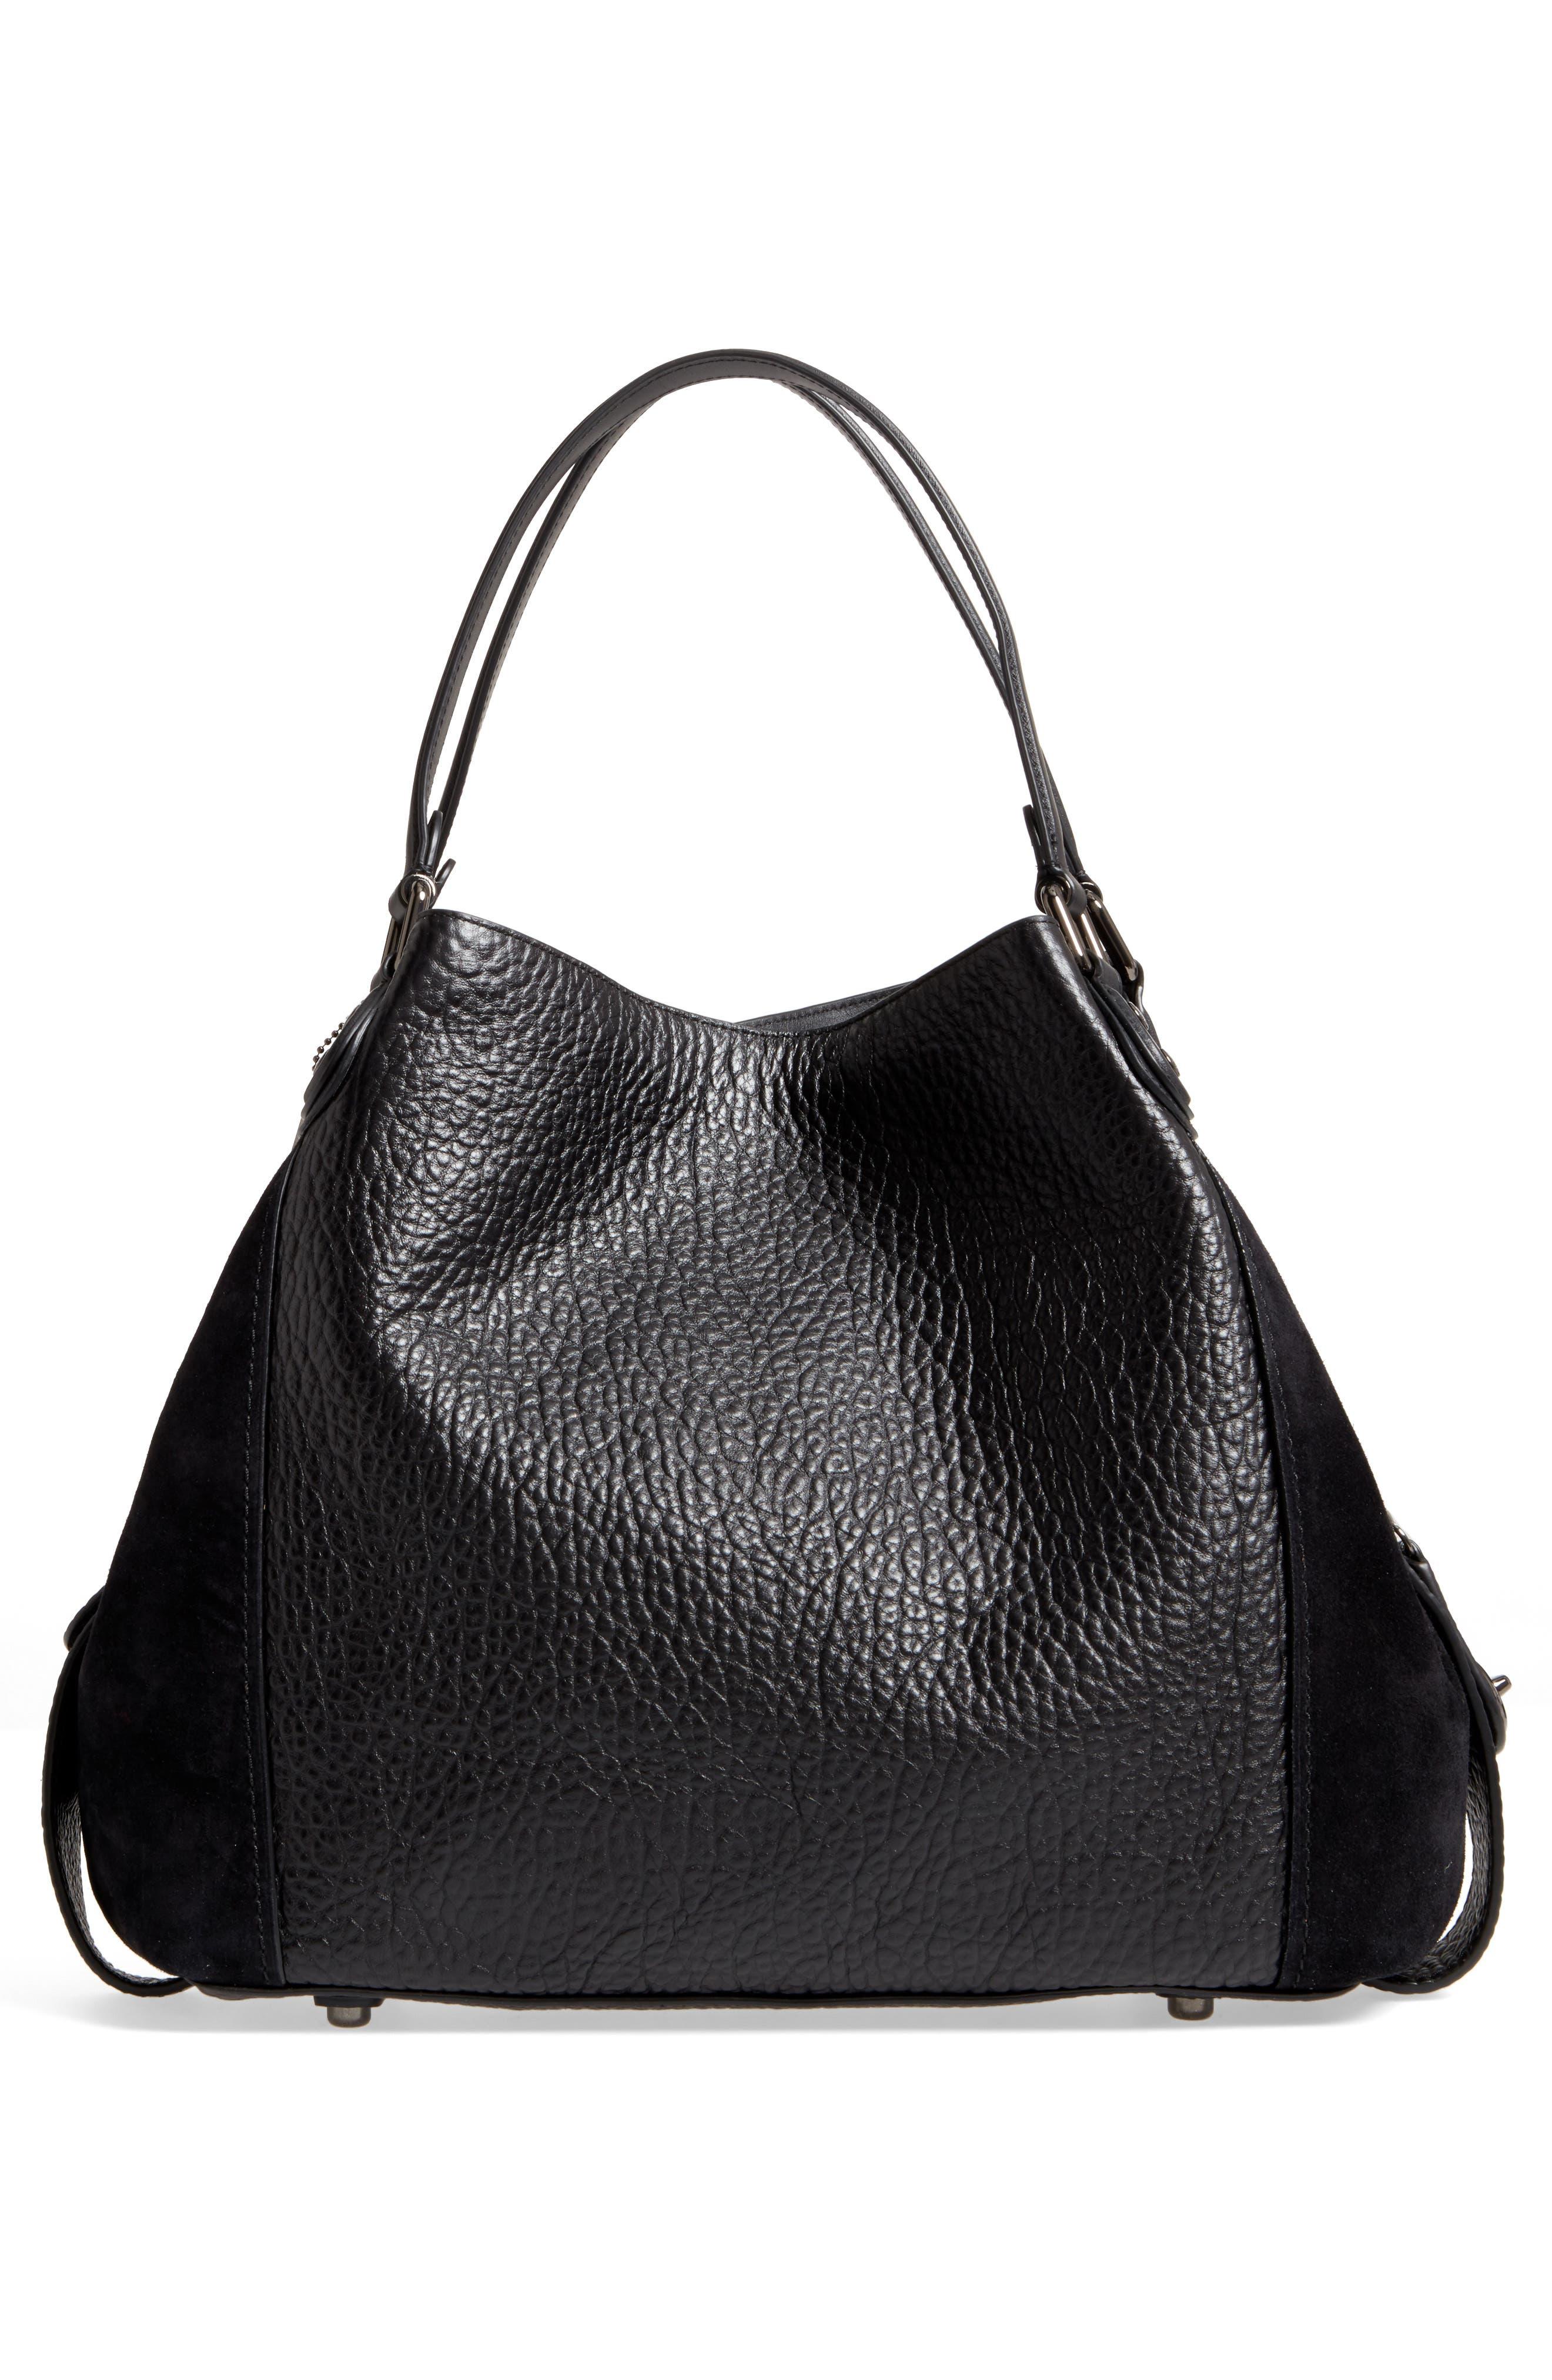 Edie 42 Leather & Suede Shoulder Bag,                             Alternate thumbnail 3, color,                             Black